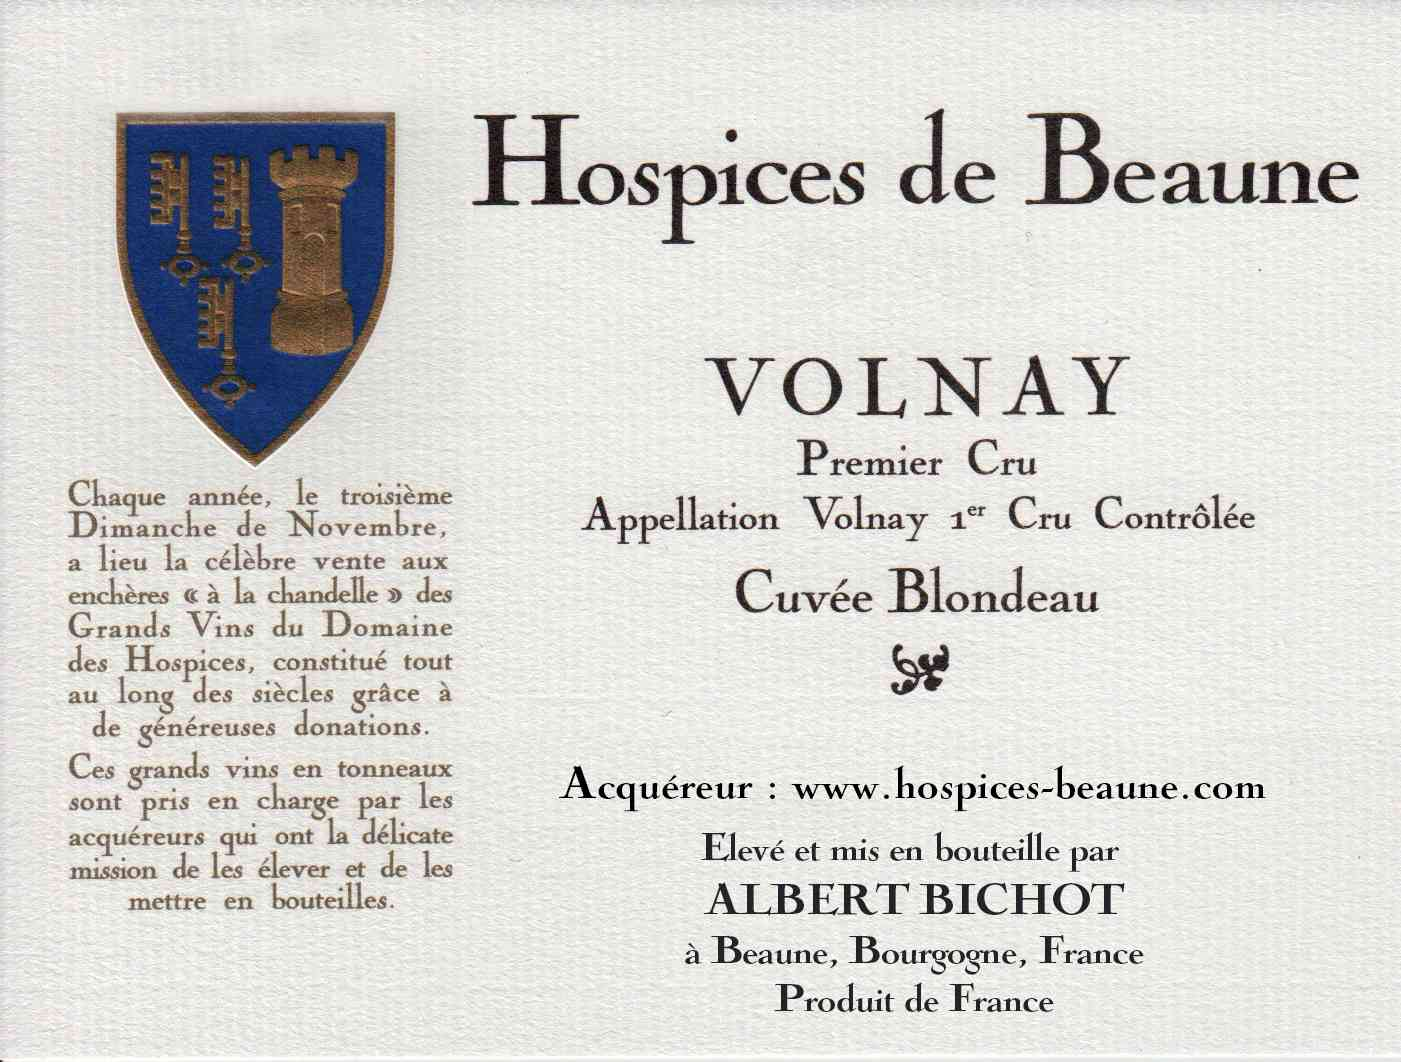 Encheres-auction-HospicesdeBeaune-AlbertBichot-Volnay-PremierCru-Cuvee-Blondeau